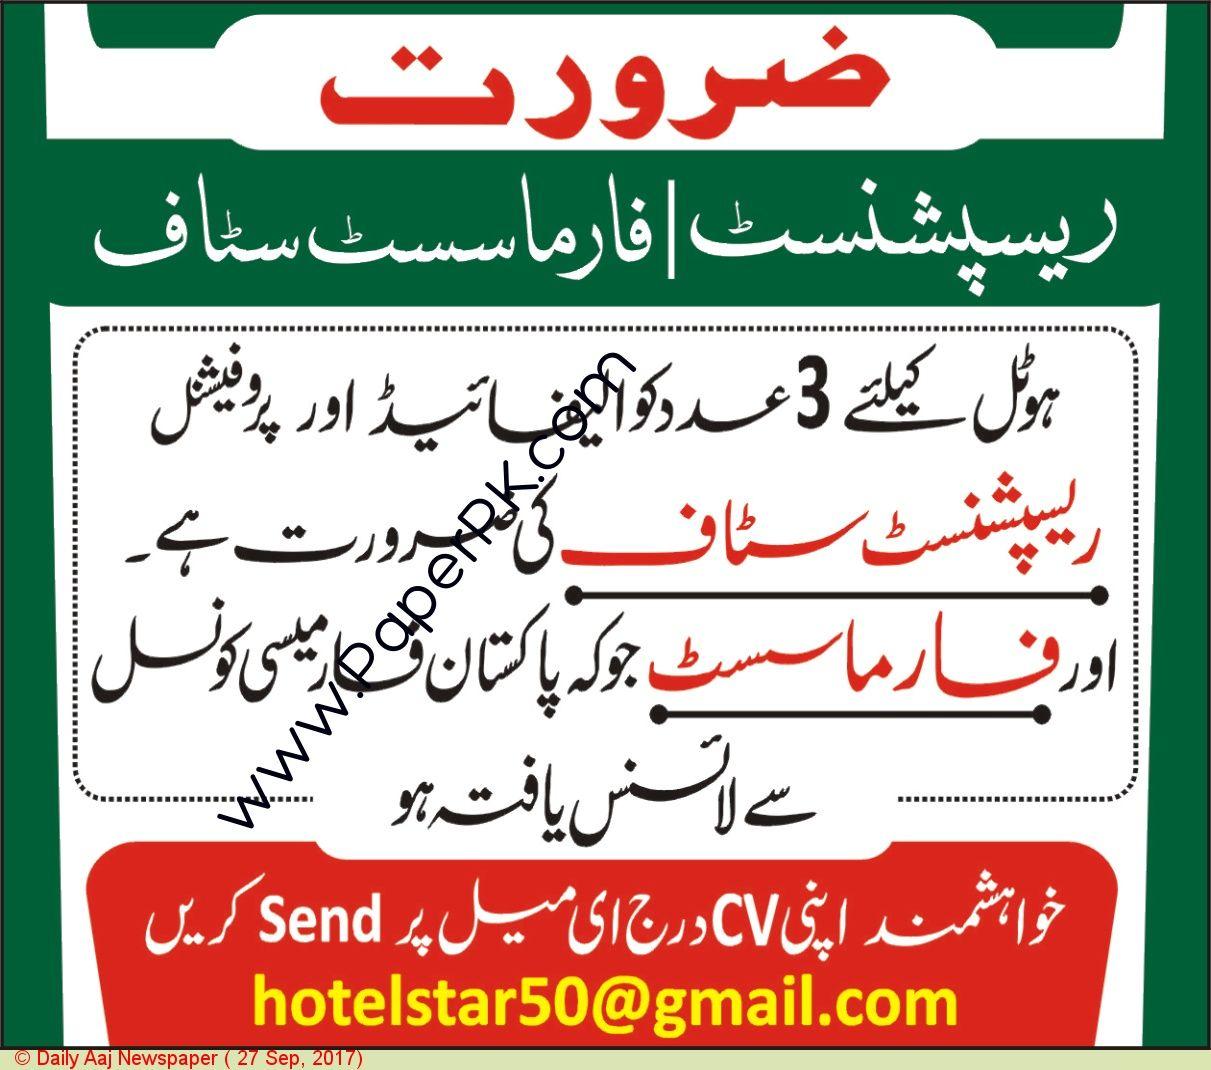 Respensionset Staff & Pharmacist Jobs In Pakistan Jobs